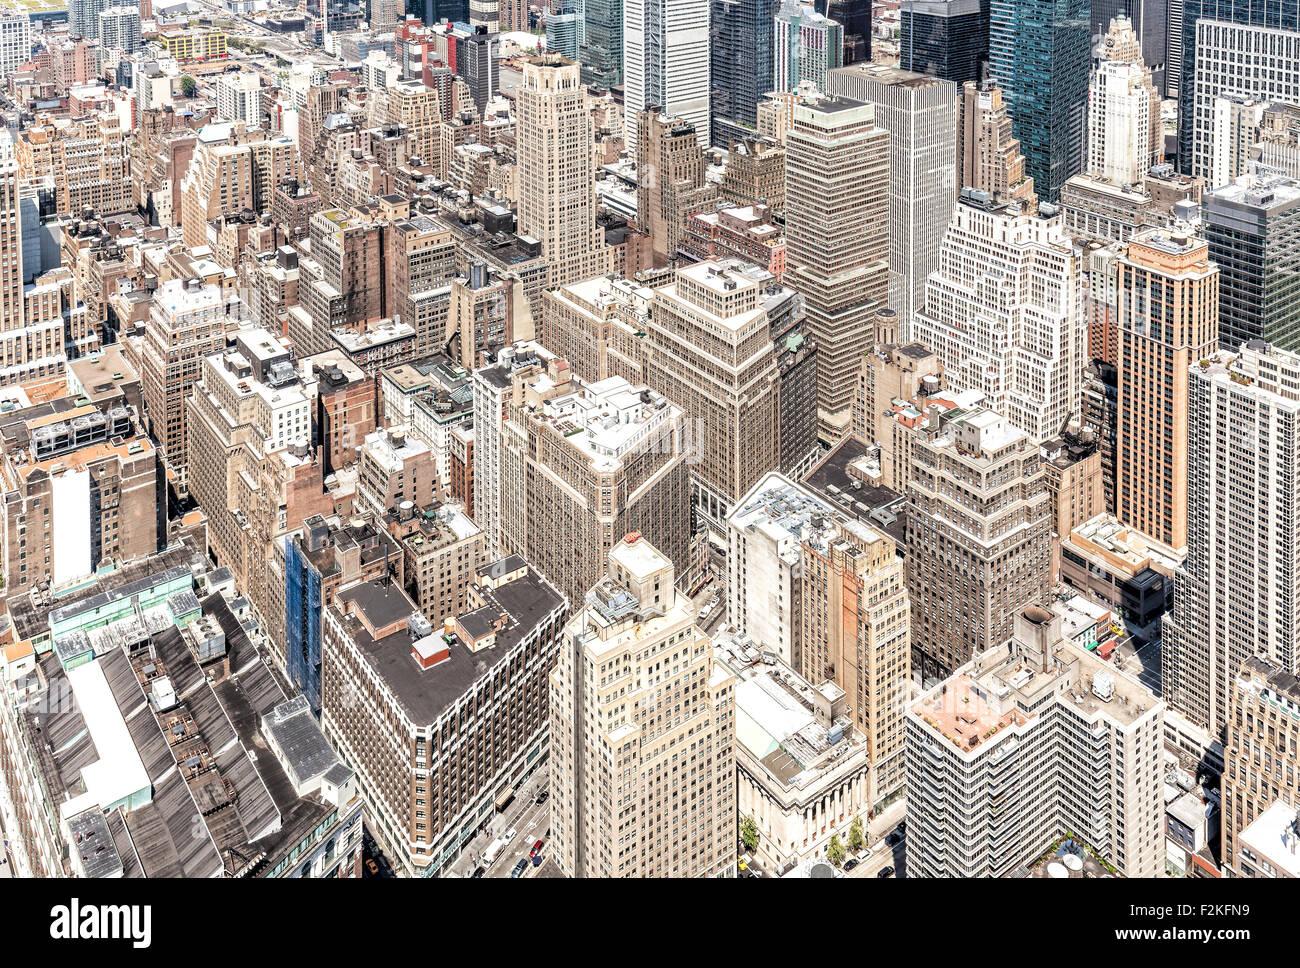 Vista aerea di Manhattan's downtown, NYC, Stati Uniti d'America. Immagini Stock